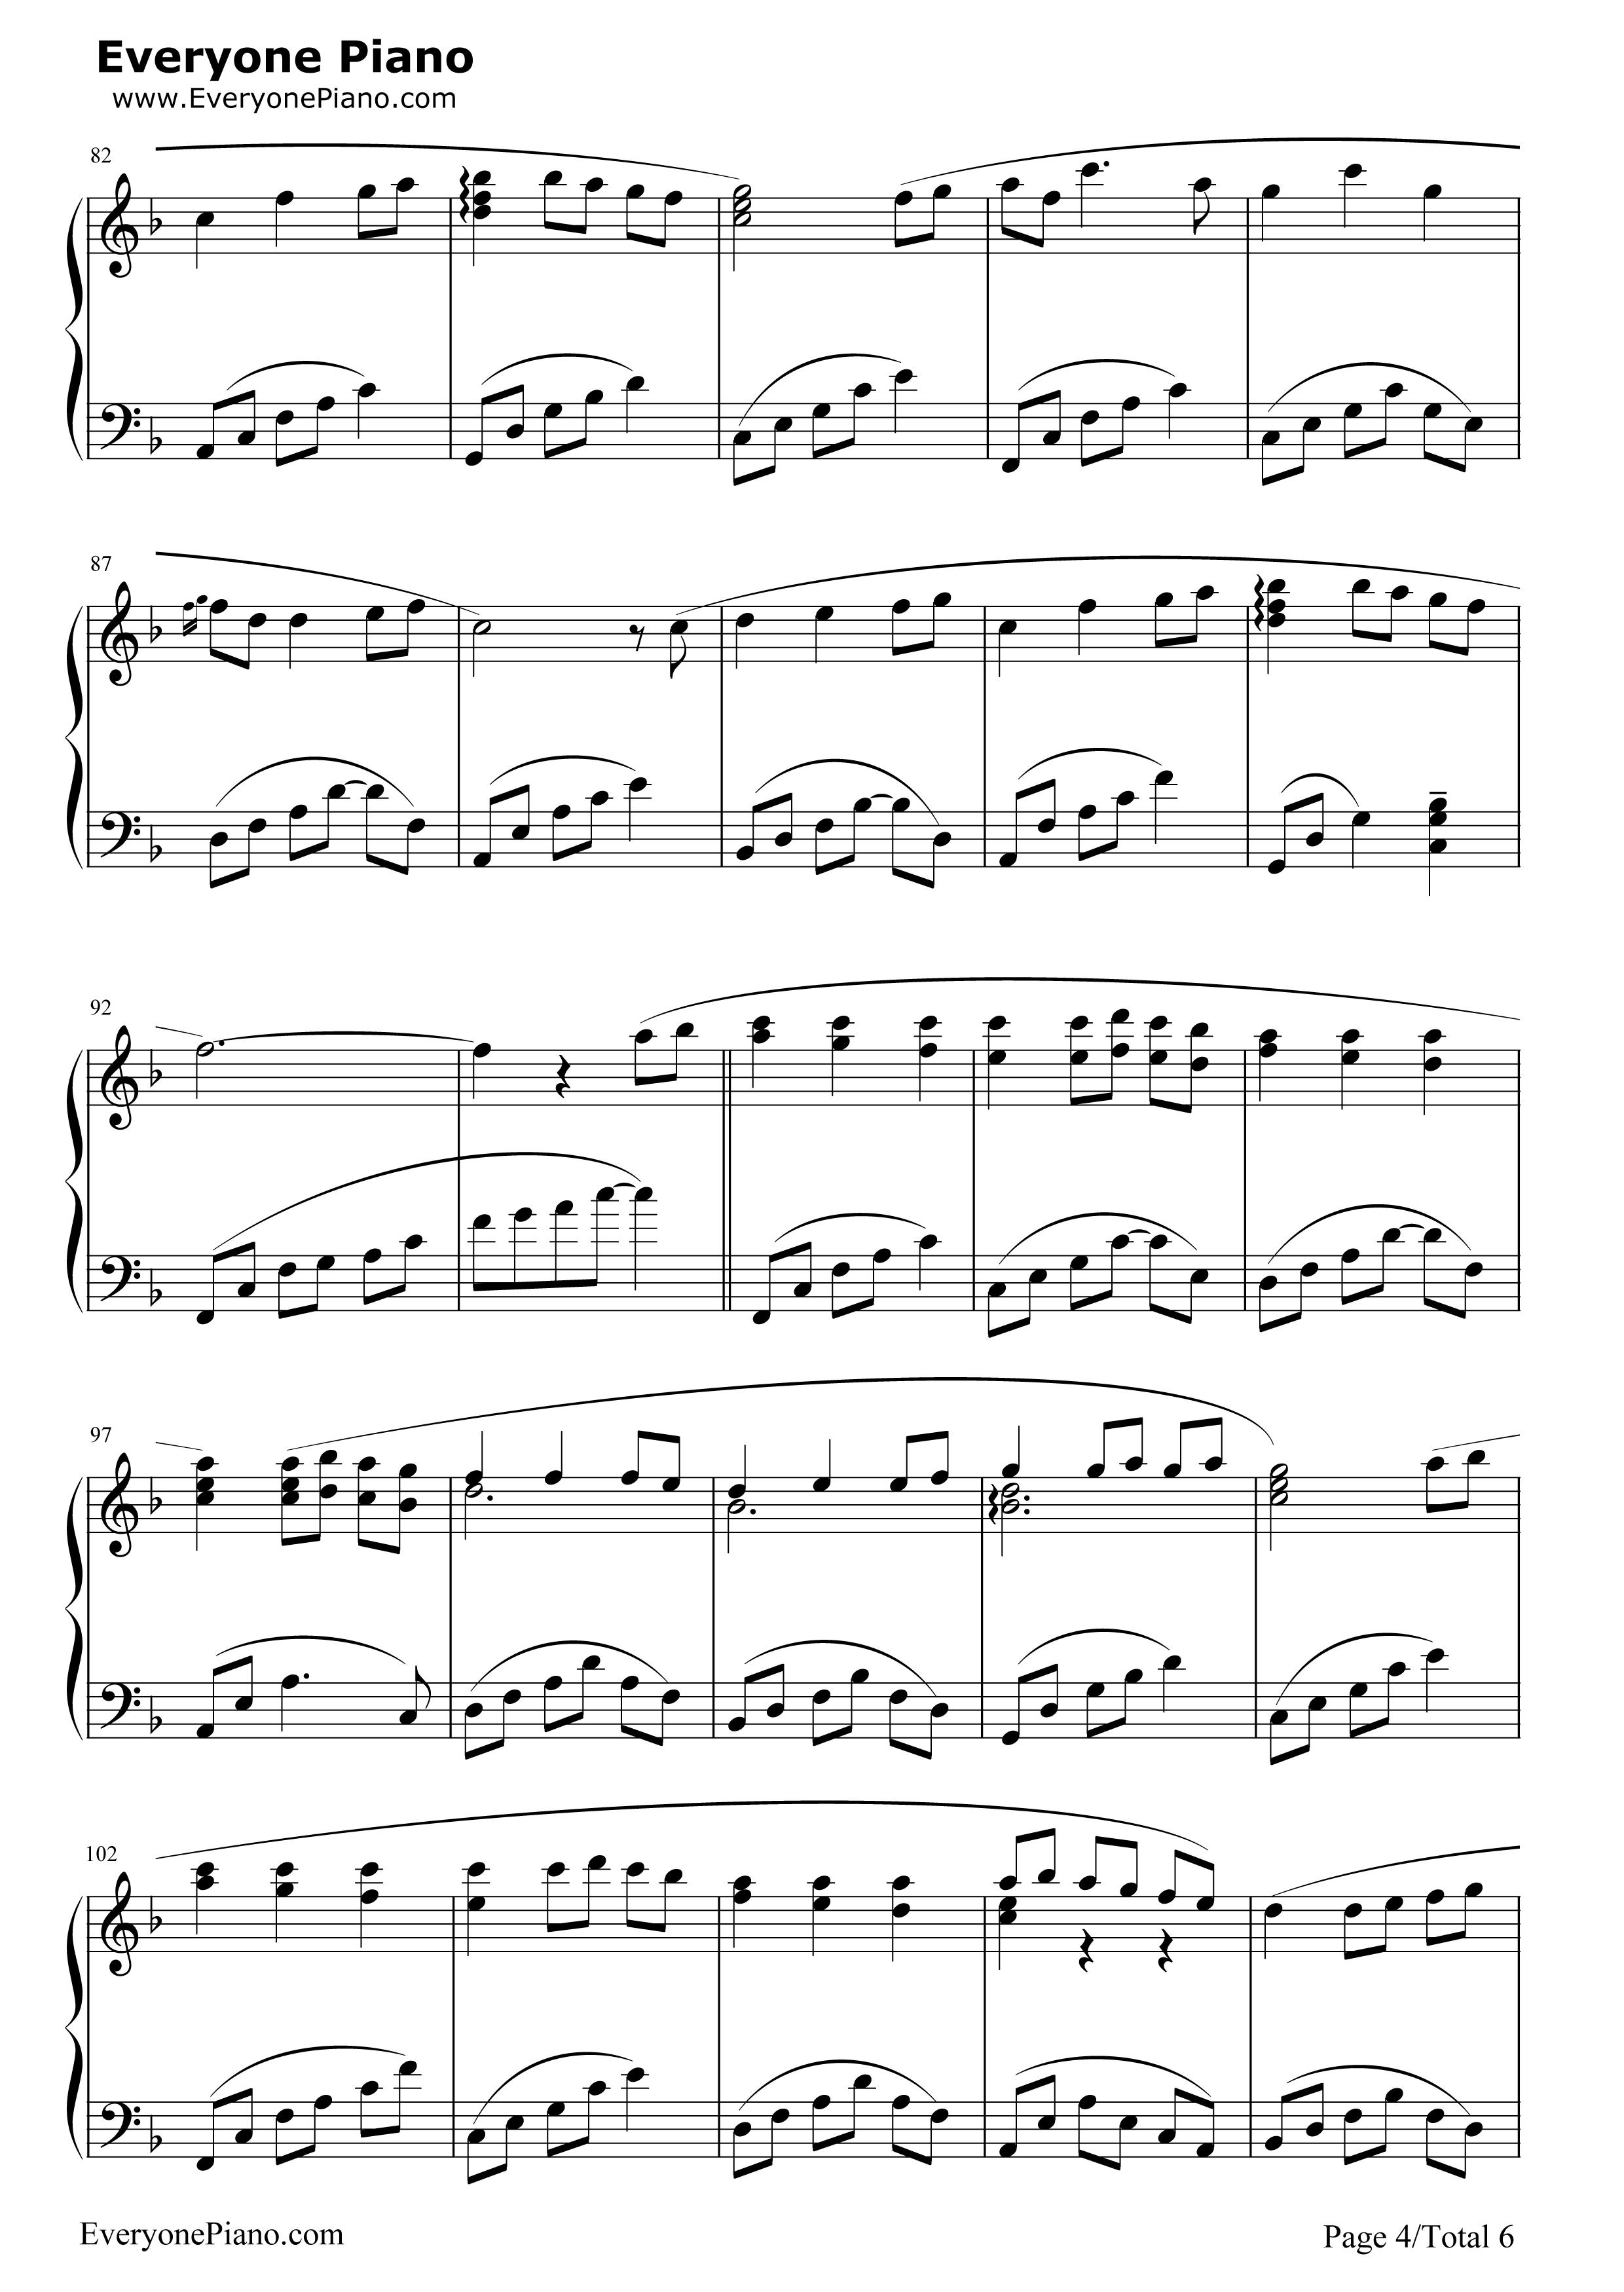 Always with Me 千与千寻片尾曲五线谱预览4 钢琴谱文件 五线谱 双手简